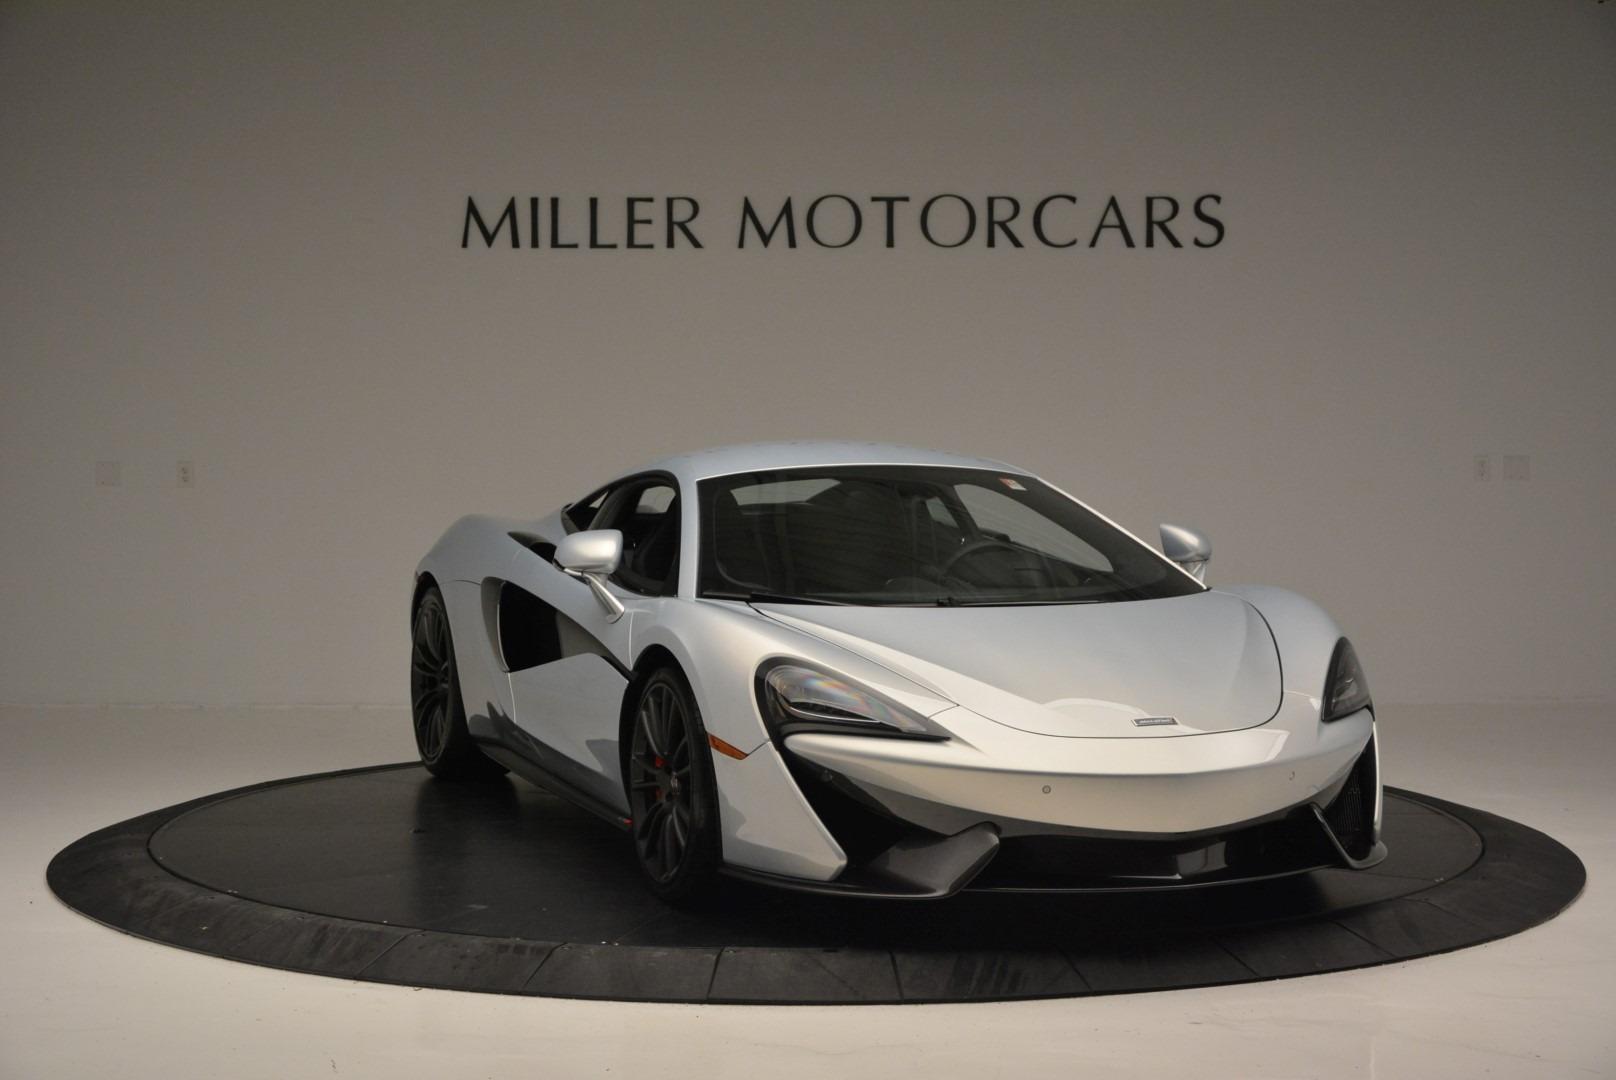 Used 2017 McLaren 570S Coupe For Sale In Westport, CT 2642_p11